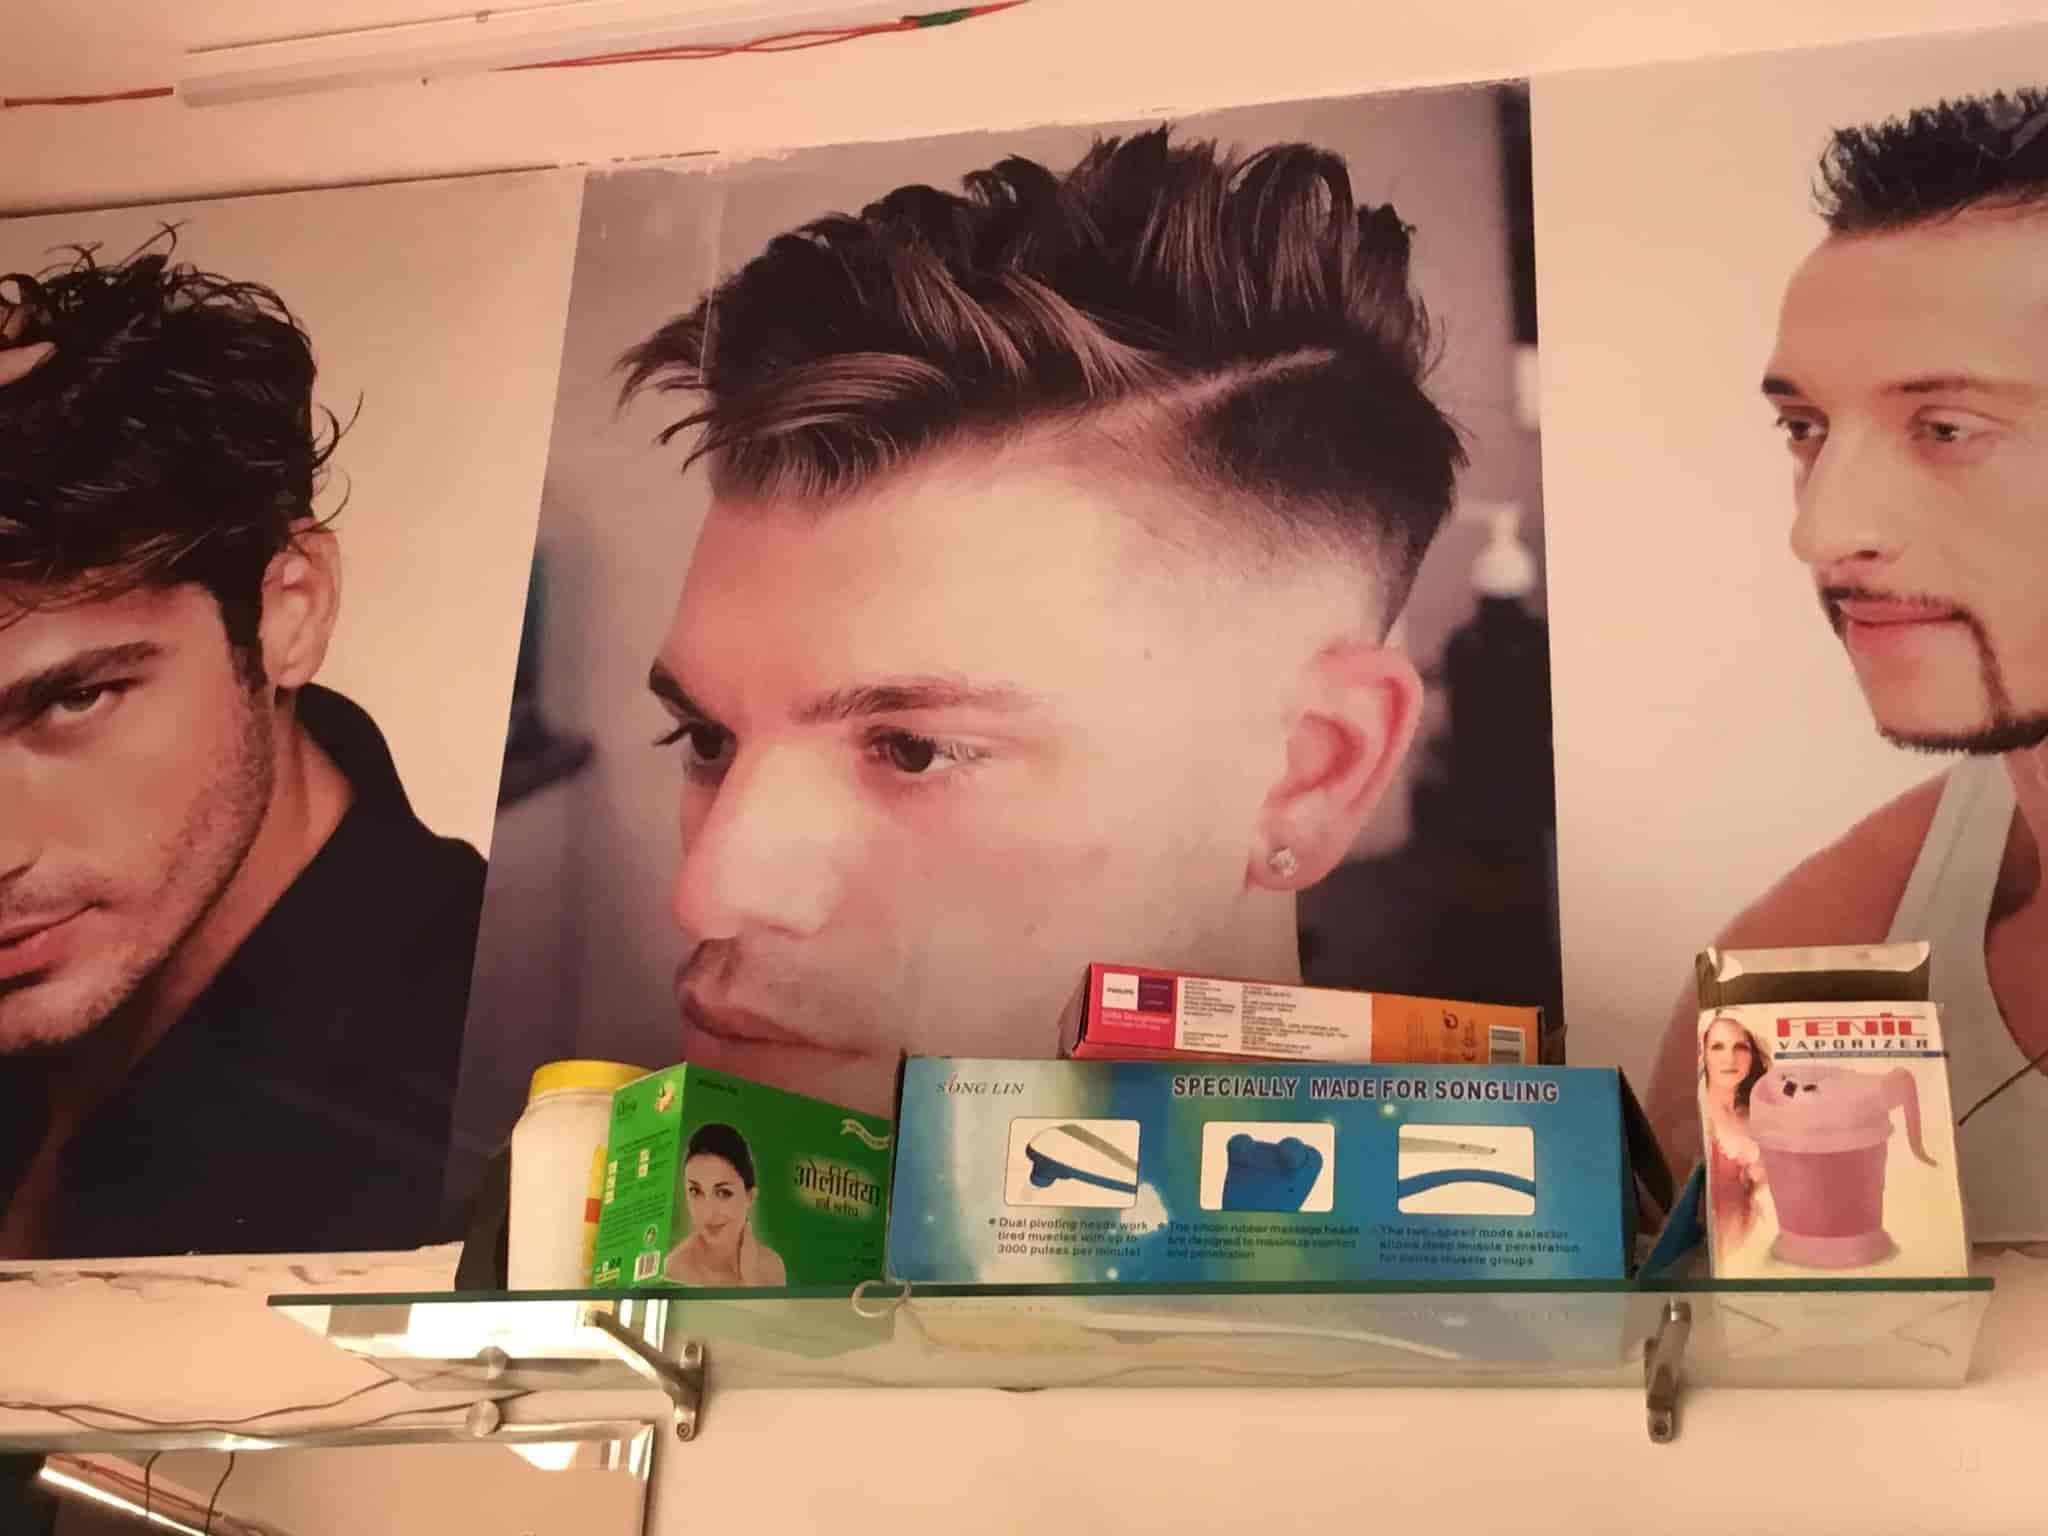 Attitude Hair Cut Photos, Mansarovar, Jaipur- Pictures & Images ...